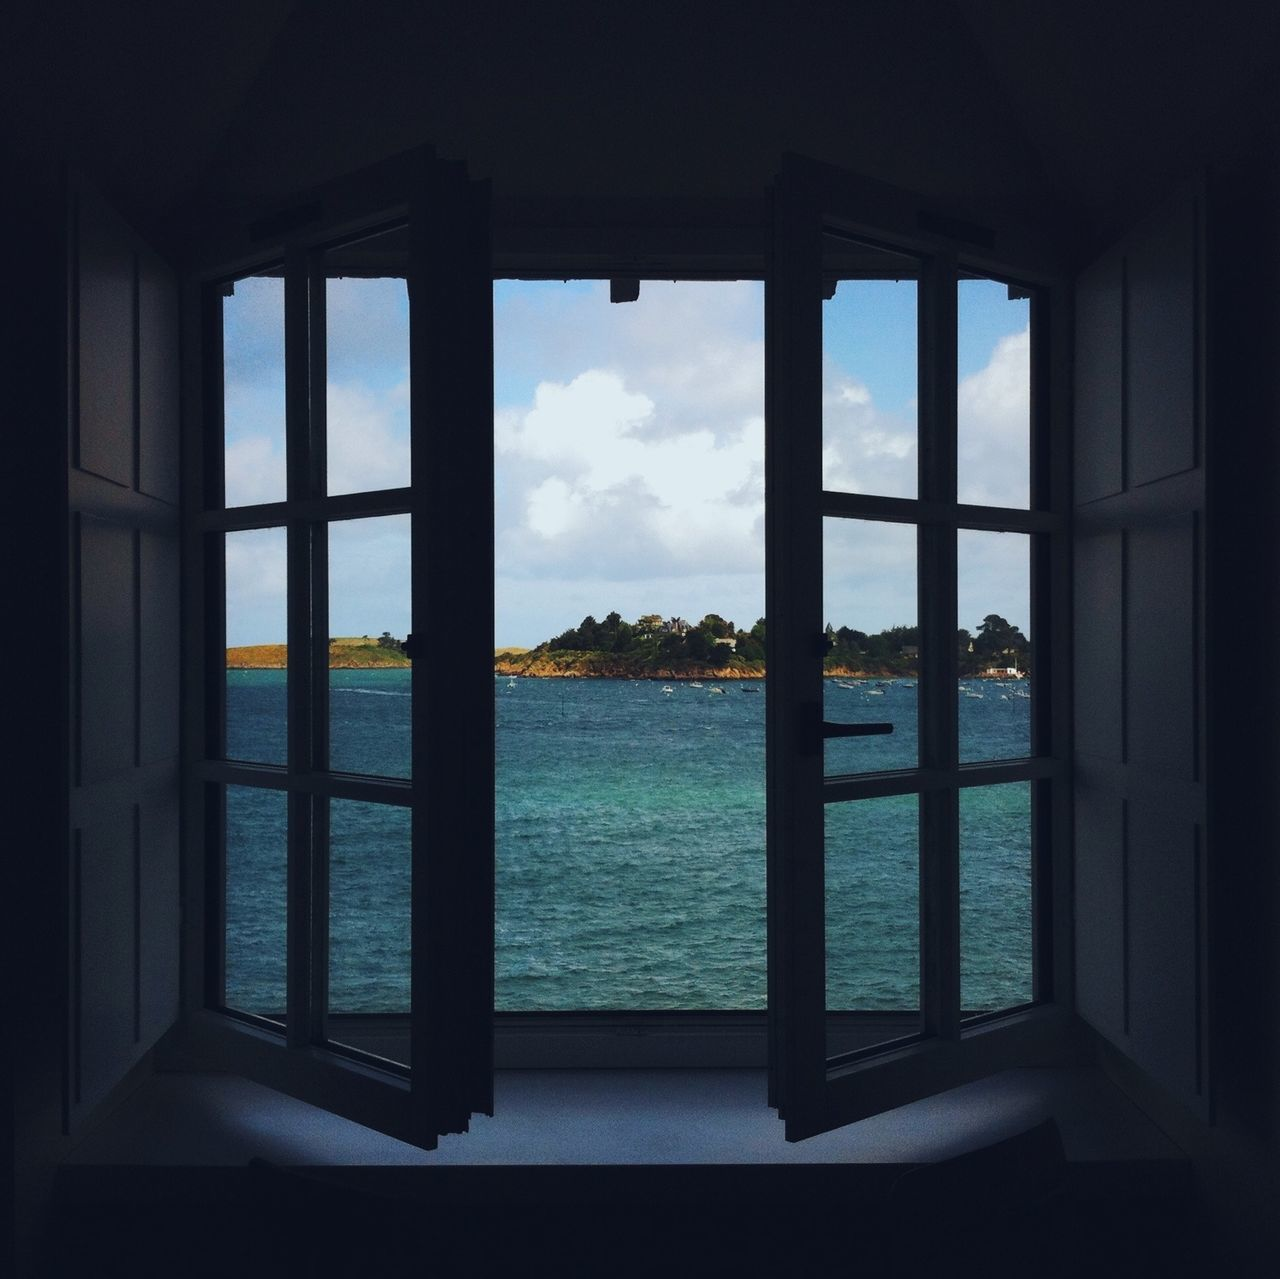 Window overlooking sea against clouds